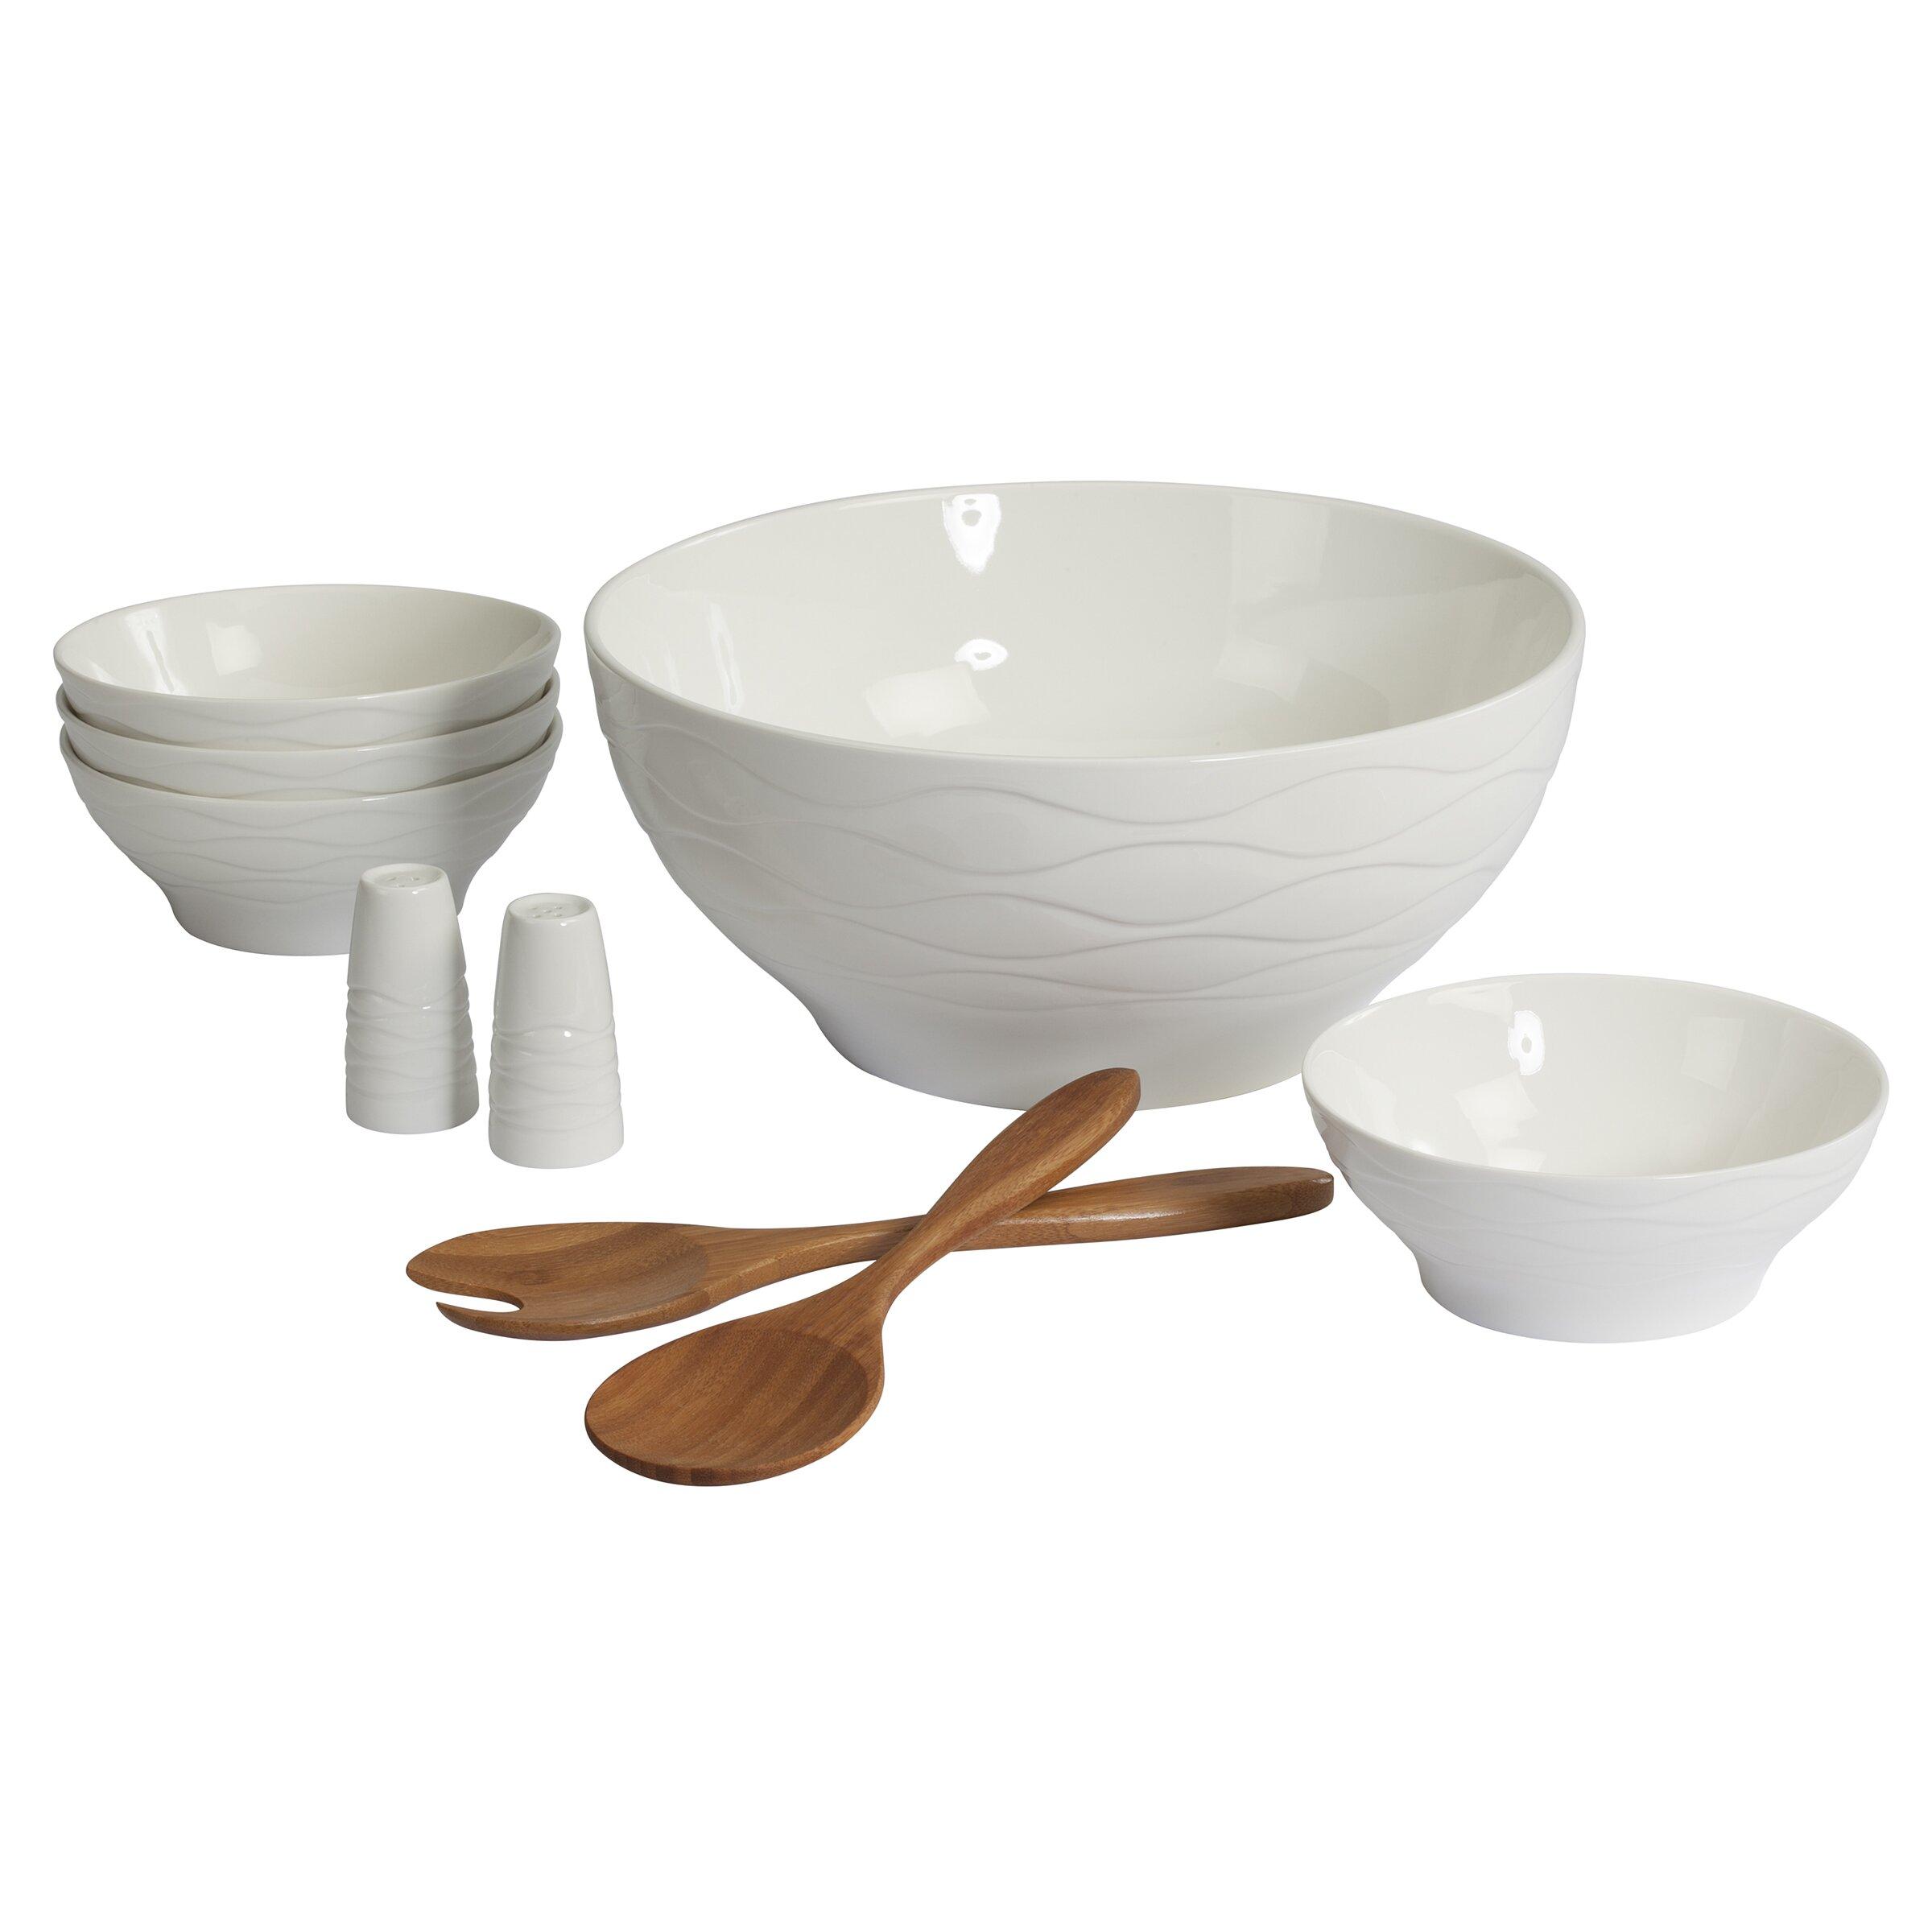 Creative Bath Wine and Dine 9 Piece Salad Serving Bowl Set ... - Creative Bath Wine and Dine 9 Piece Salad Serving Bowl Set